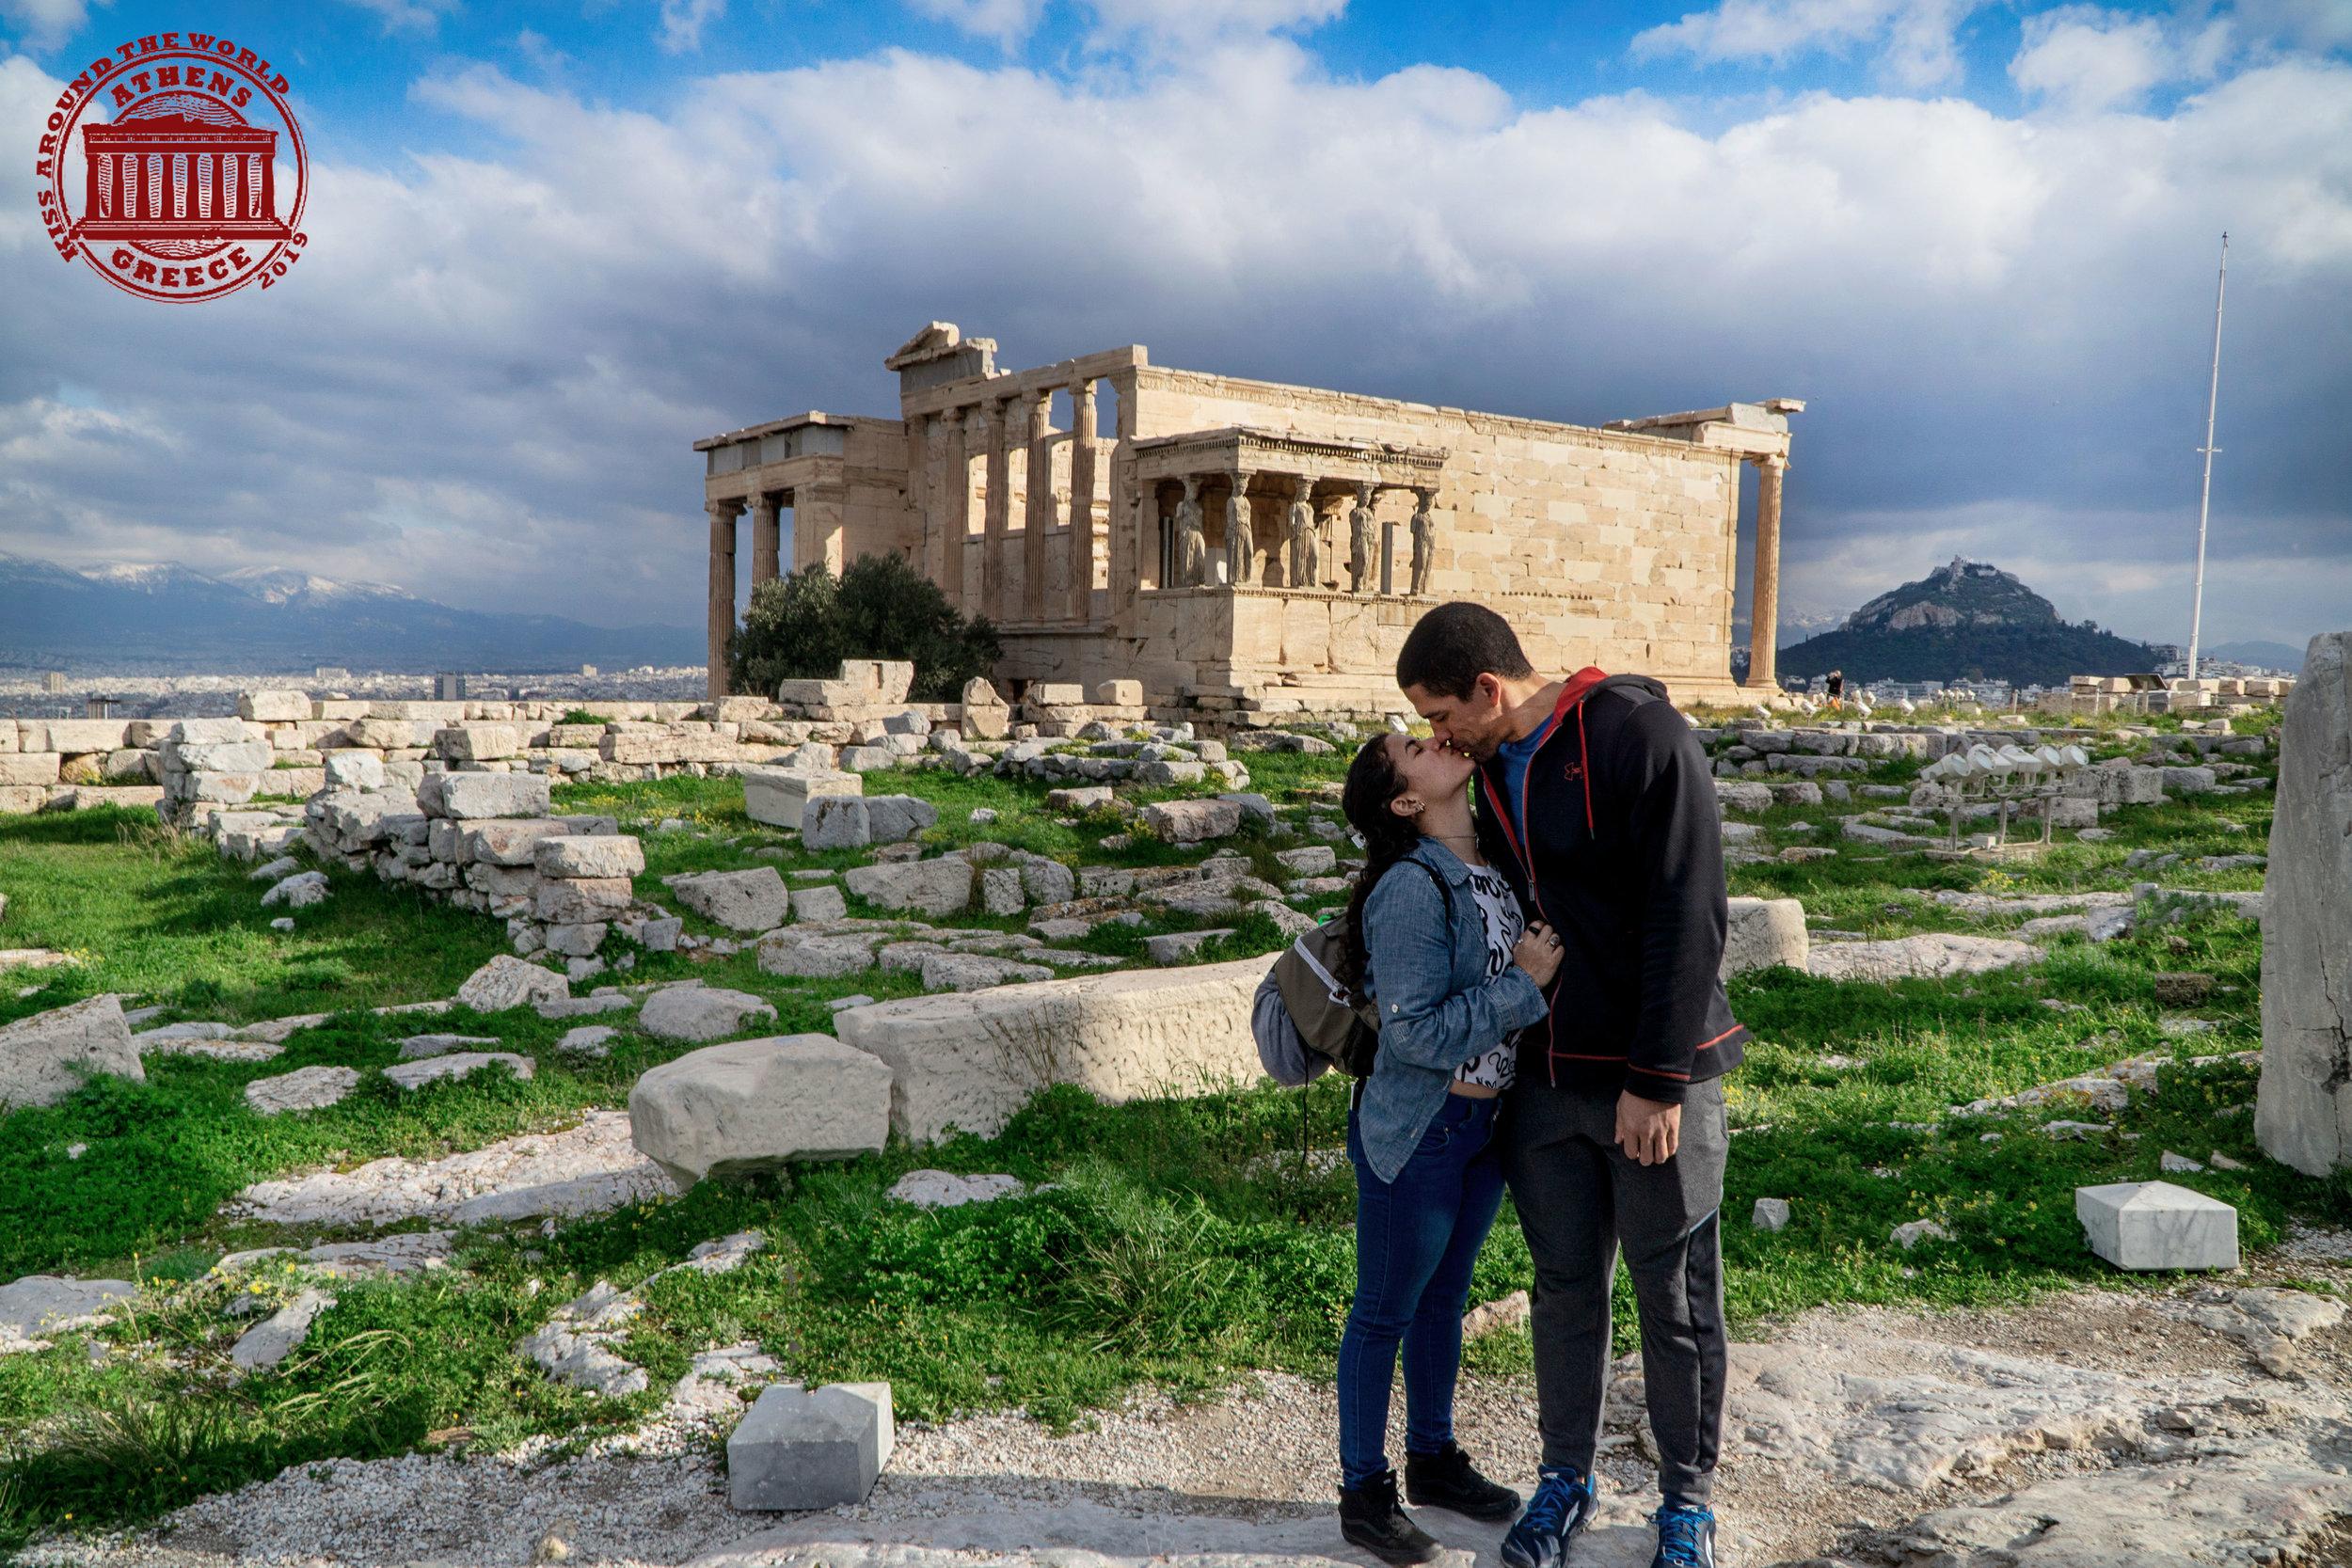 athens_acropolis_vickygood_photography_kiss-around-the-world.jpg